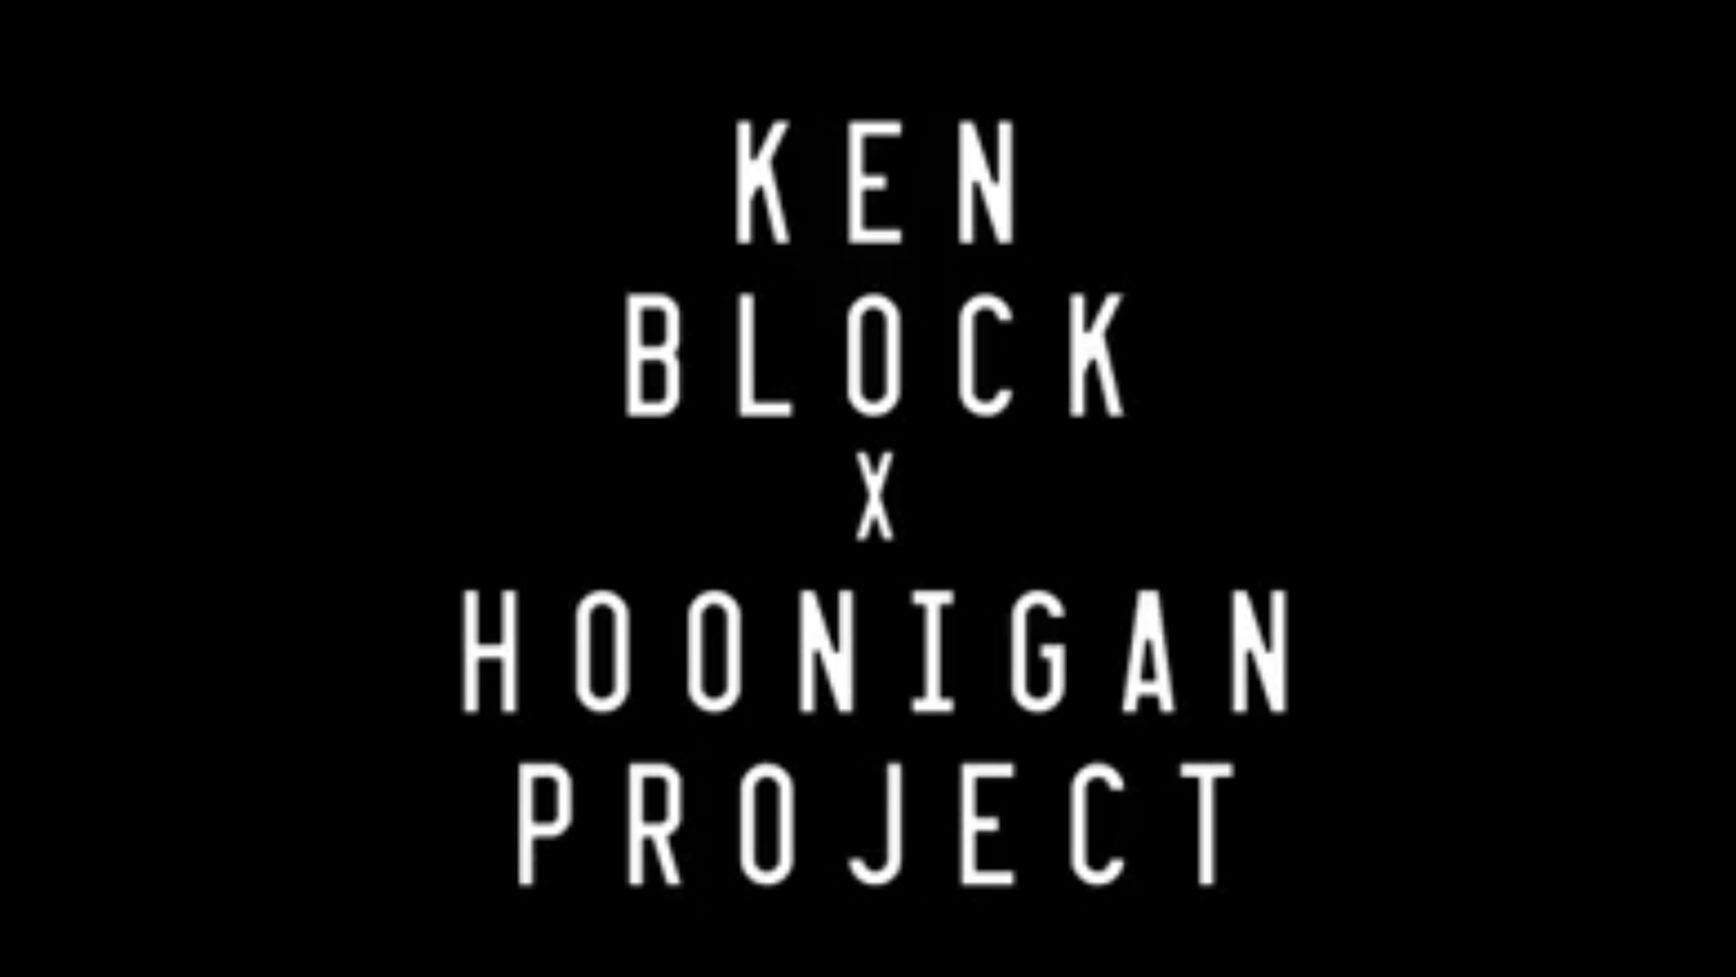 Ken Block x Hoonigan project: 1978 Ford Escort Mk2 RS